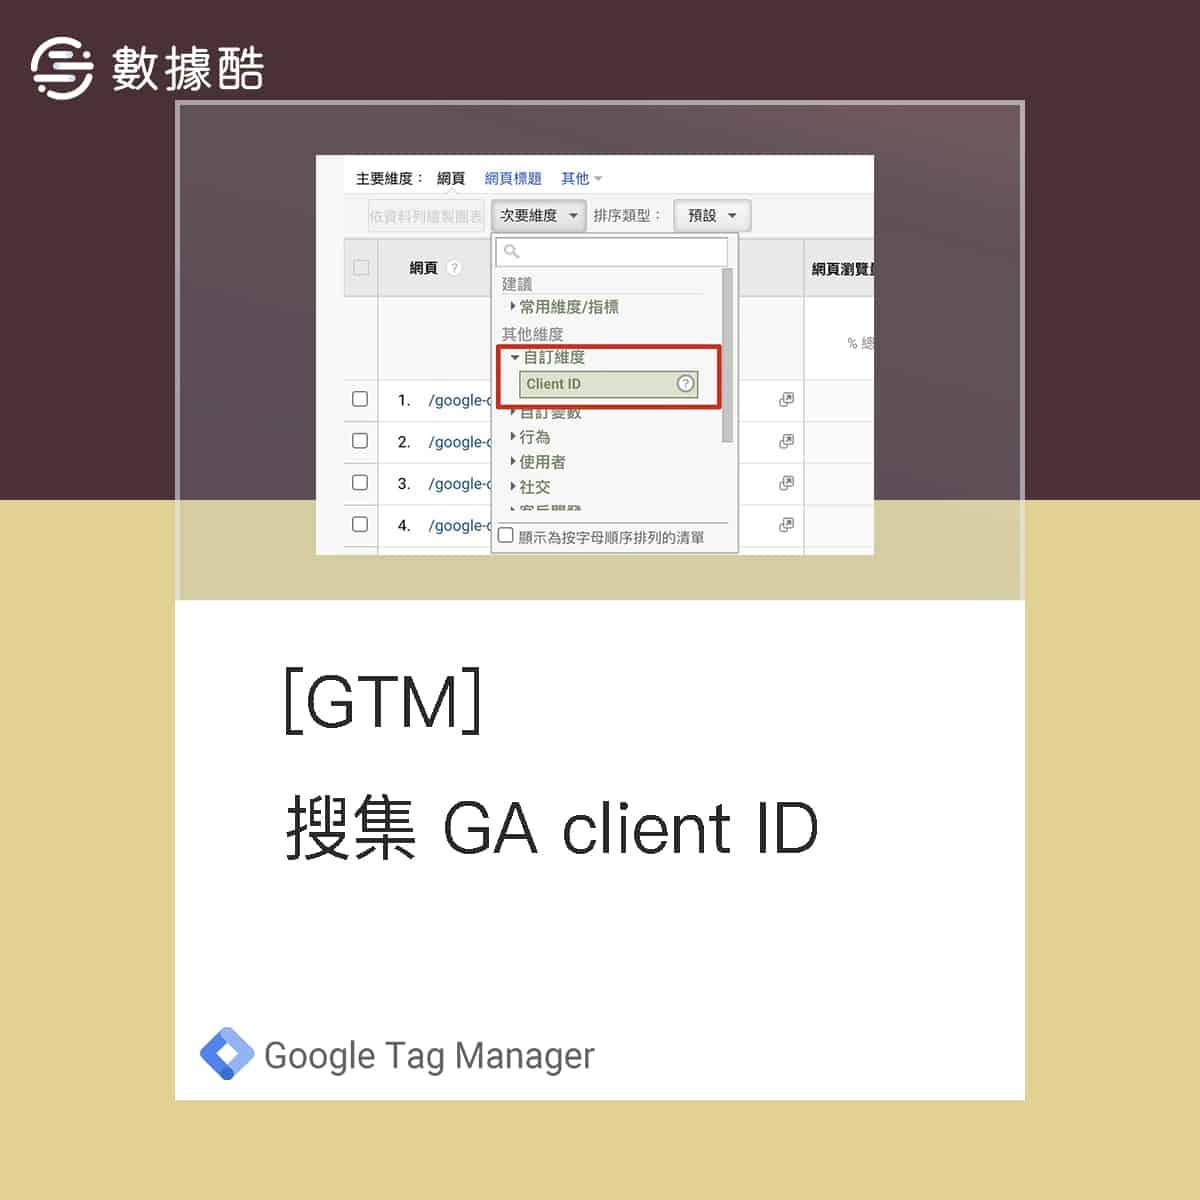 Google Tag Manager 使用 Google Analytics 自訂維度儲存網站 client id